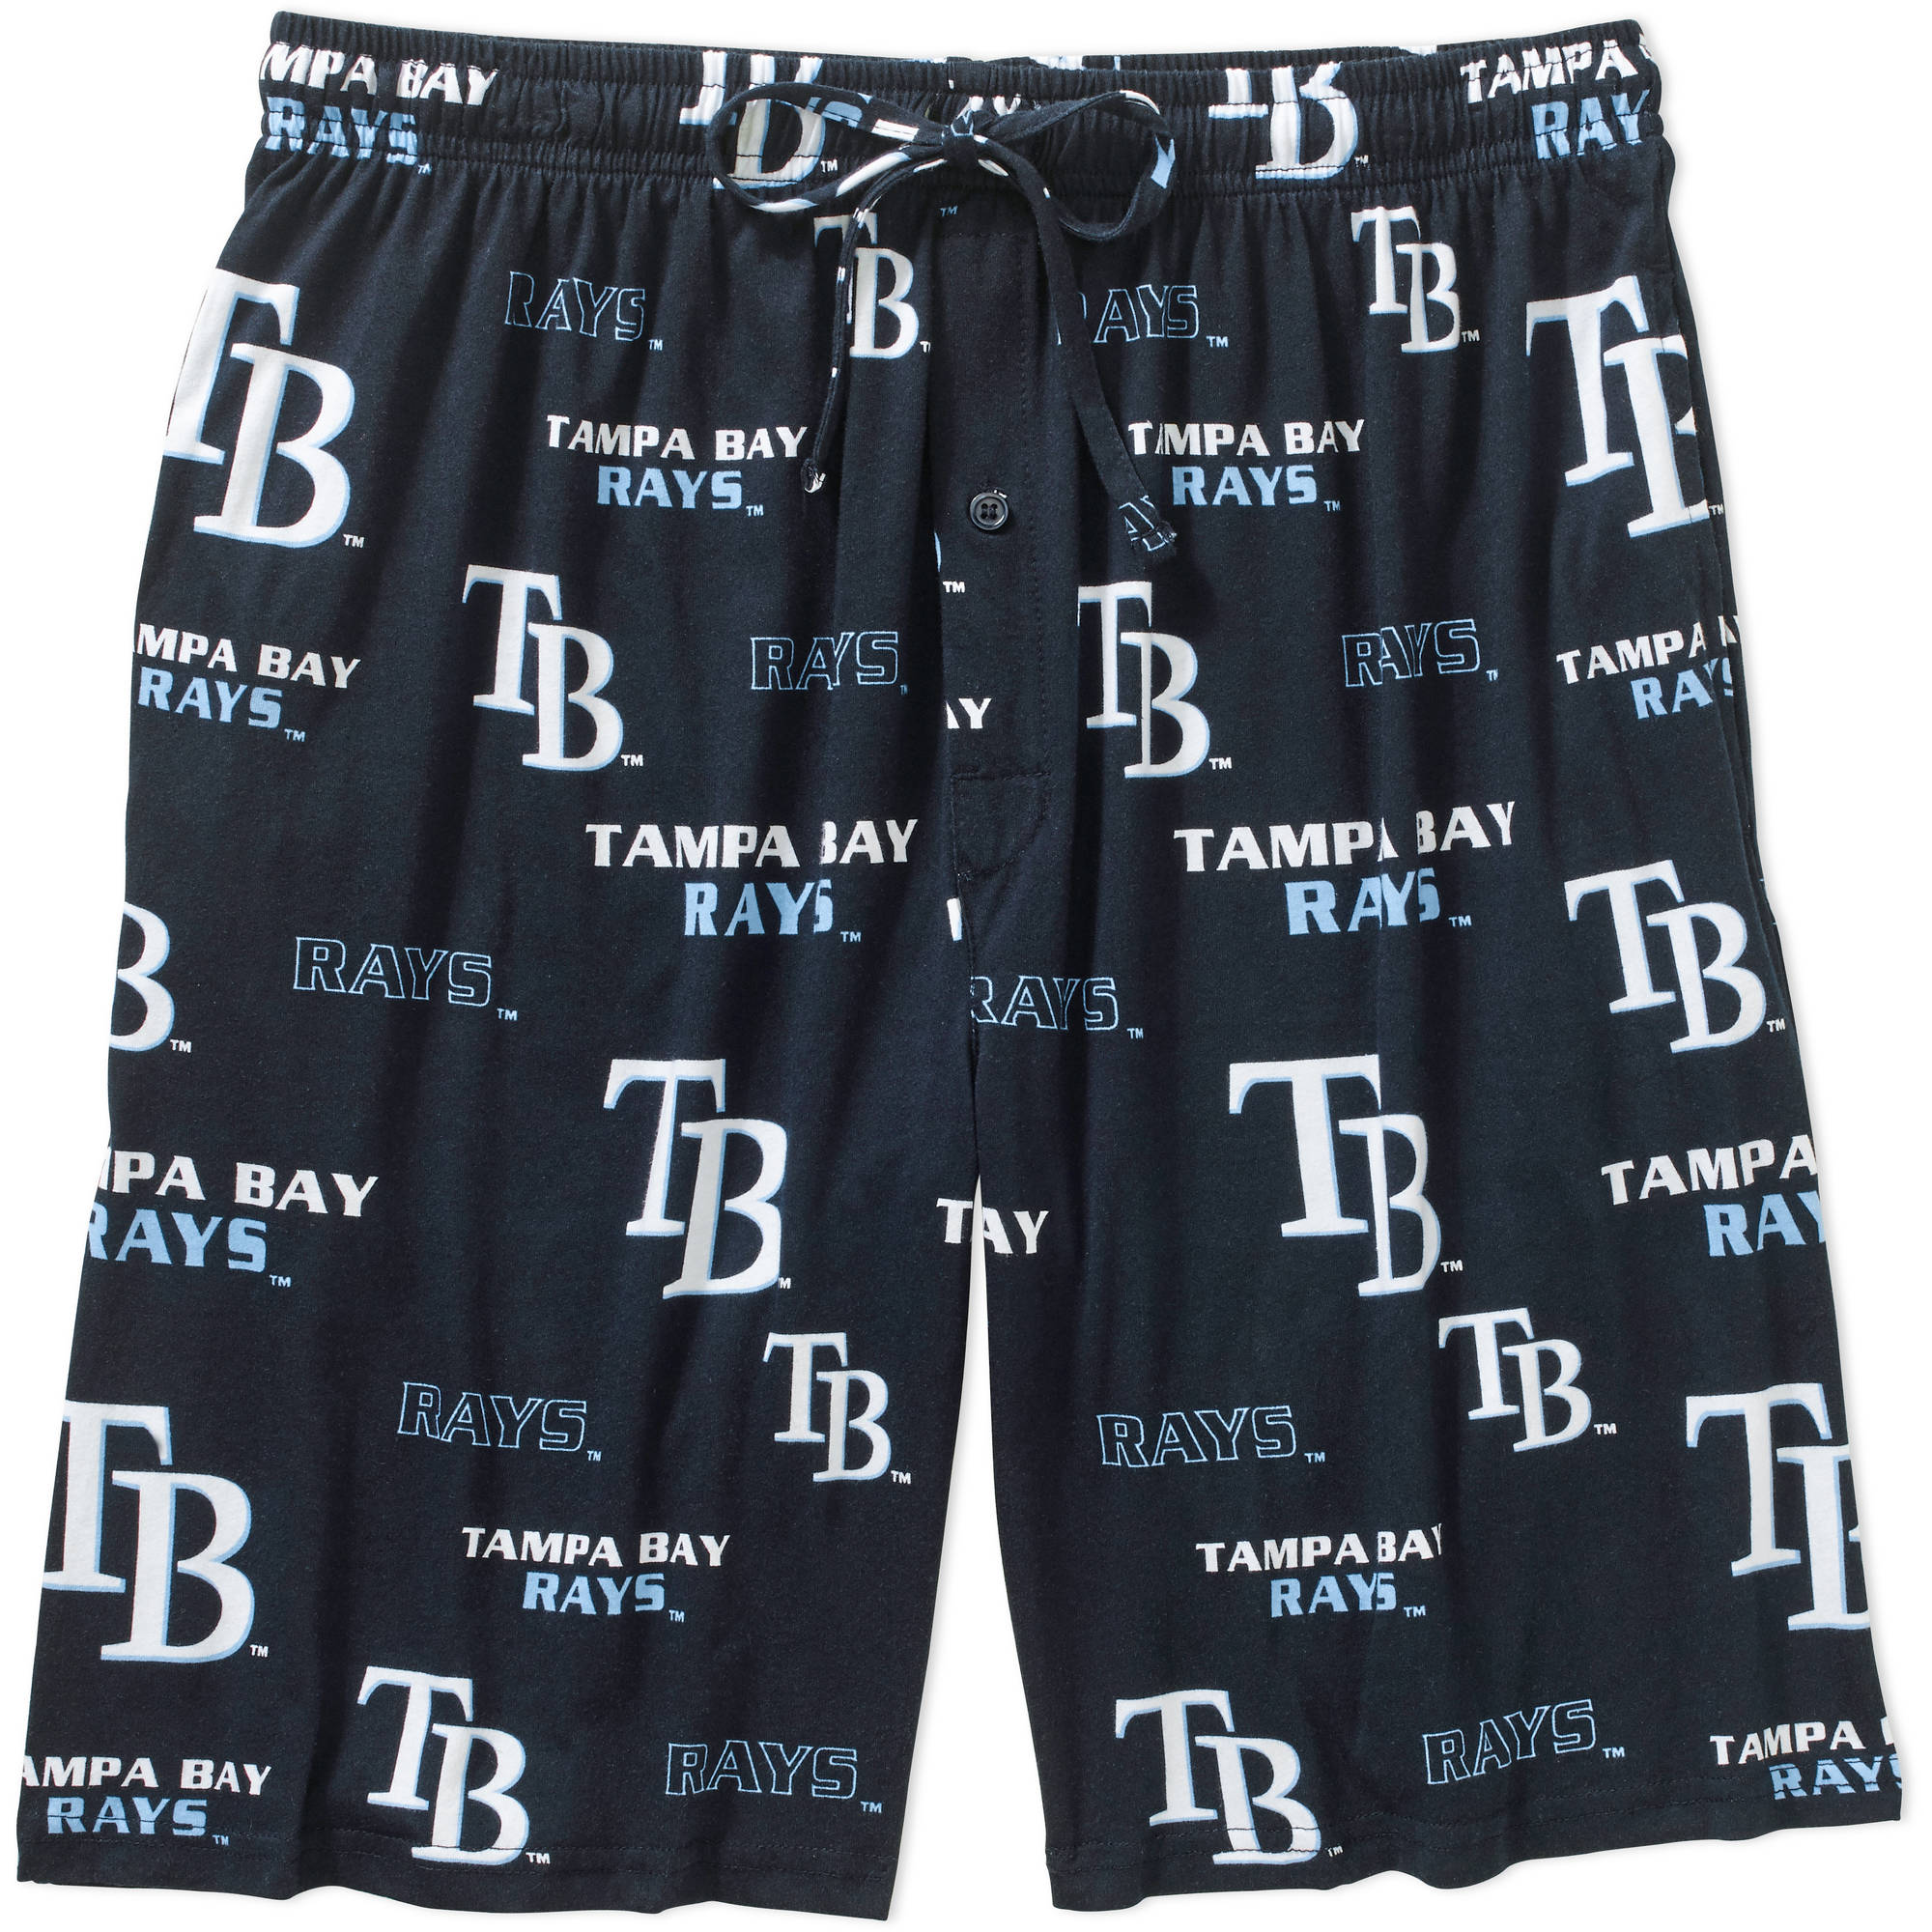 MLB Men's Tampa Bay Rays Knit Jam Shorts WQM-0631